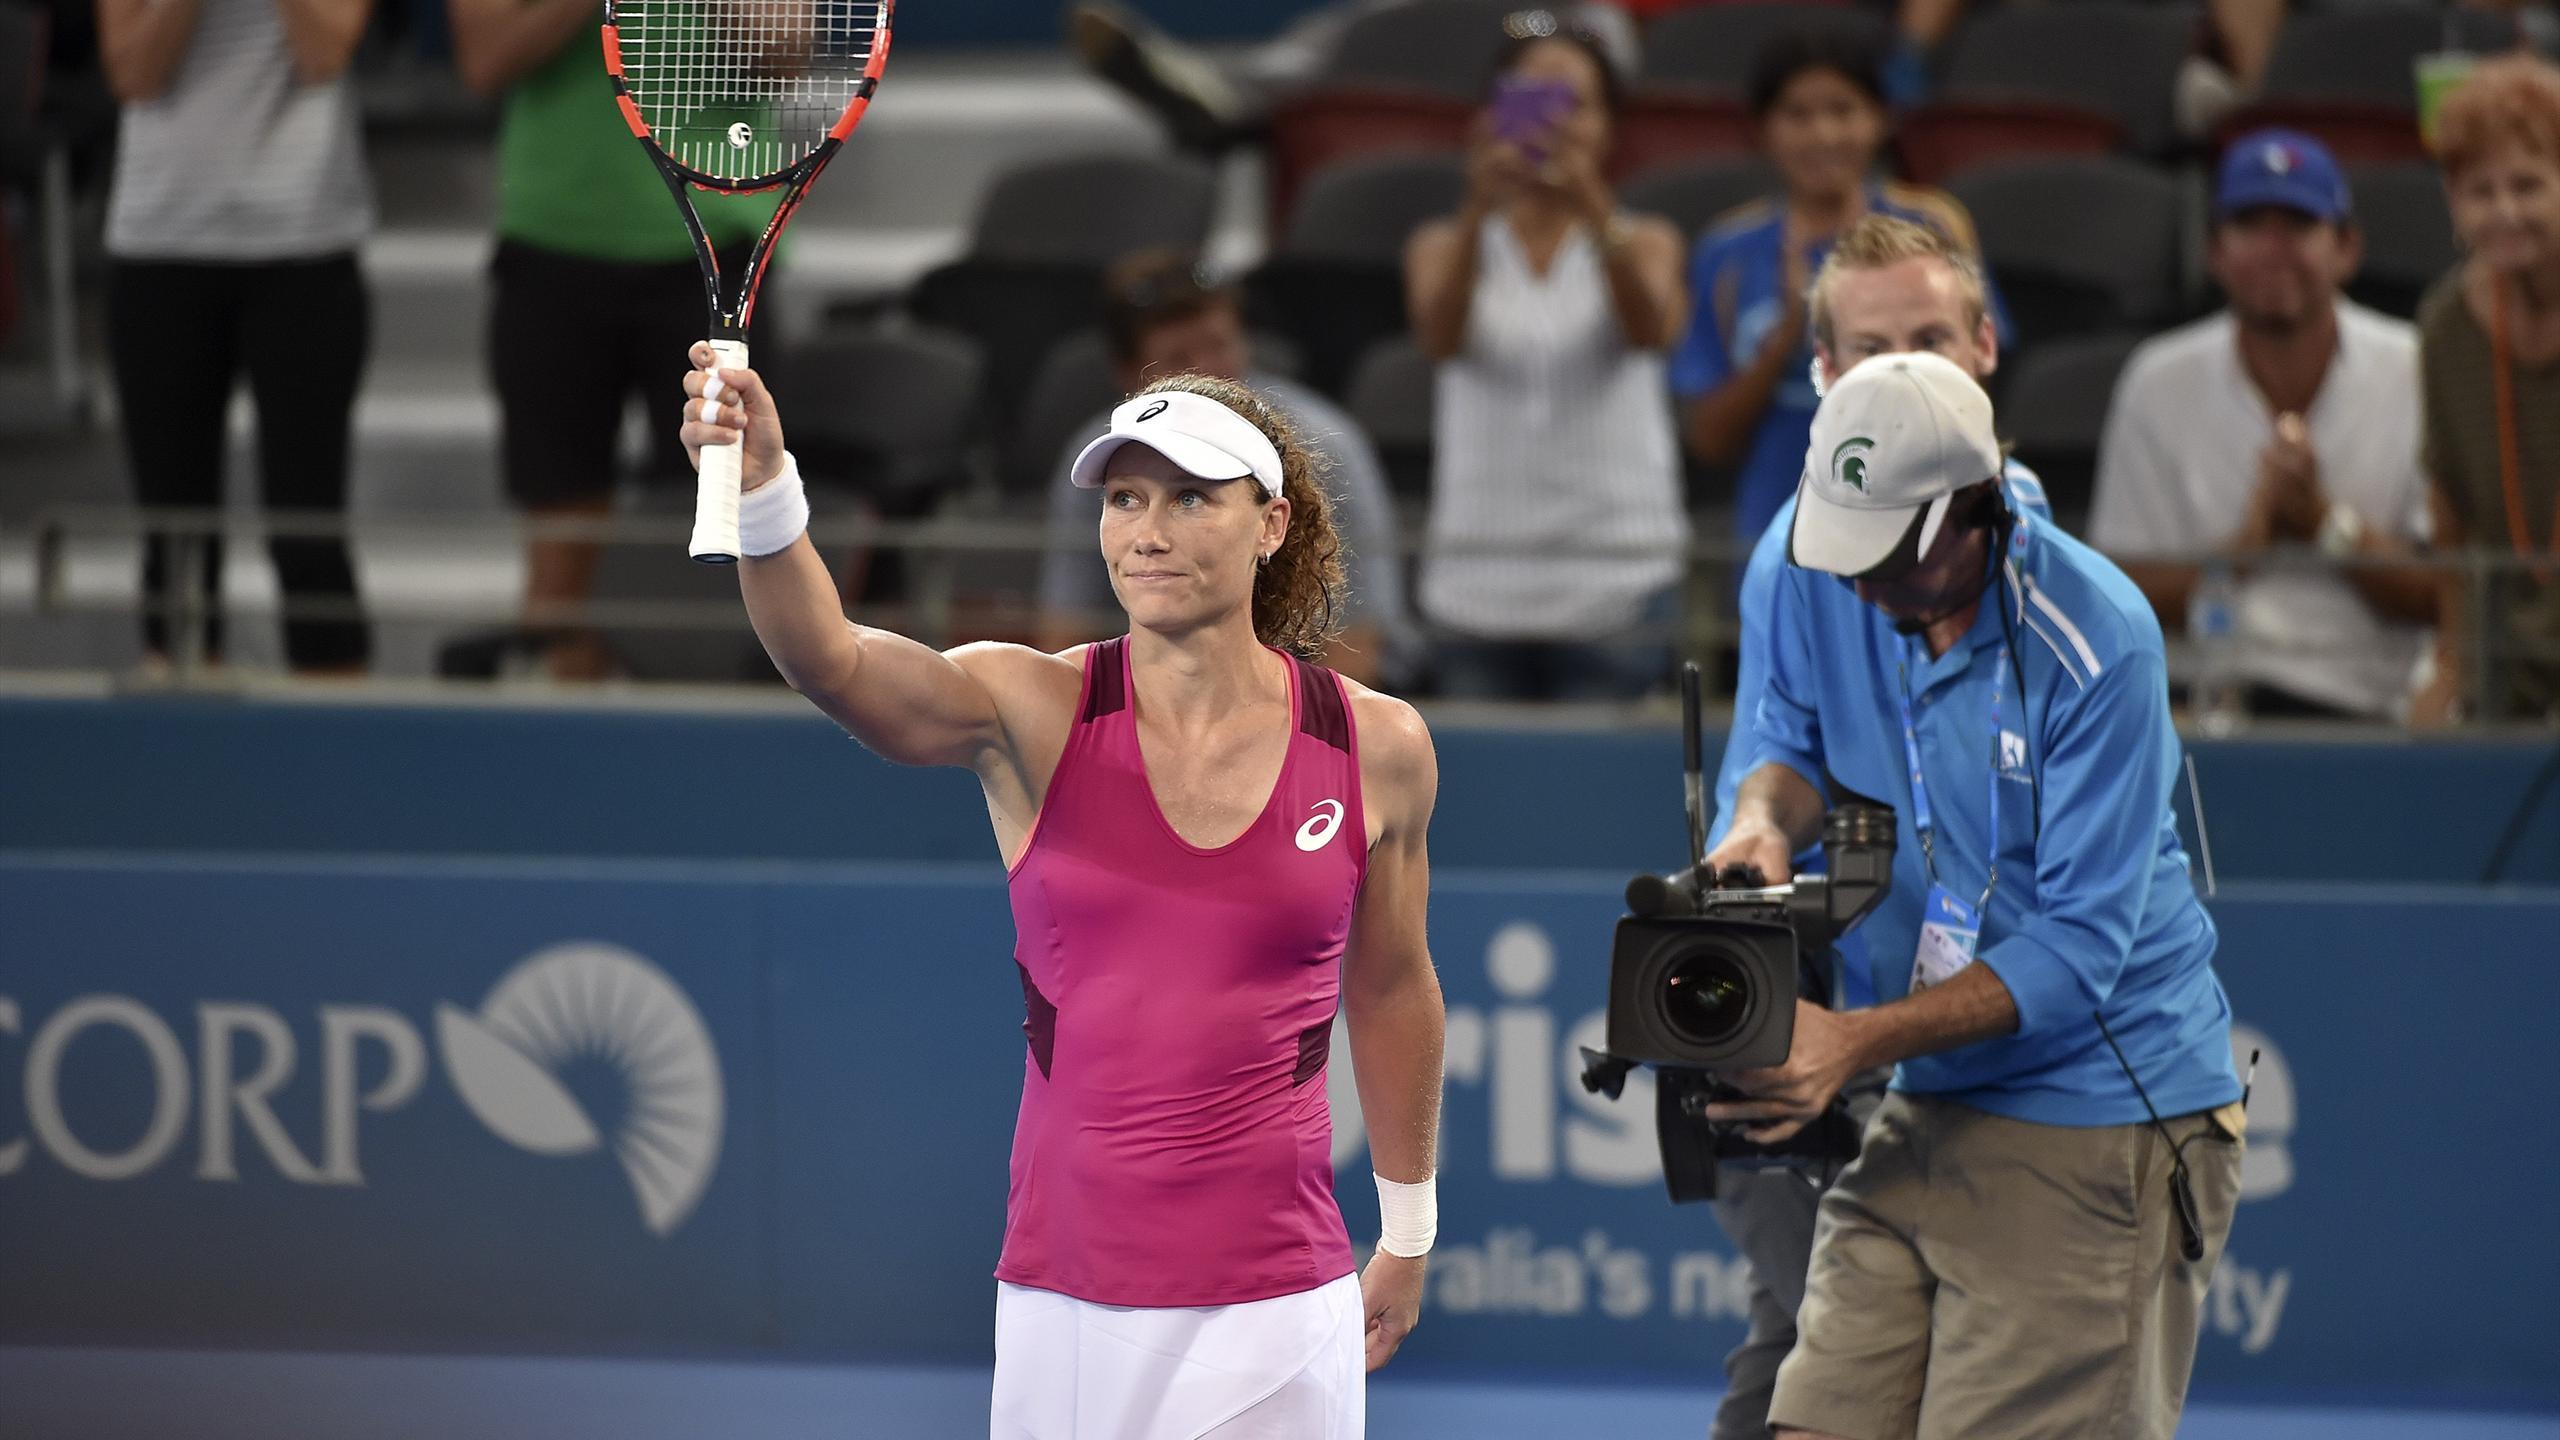 Australia's Samantha Stosur celebrates her victory against Slovakia's Jana Cepelova